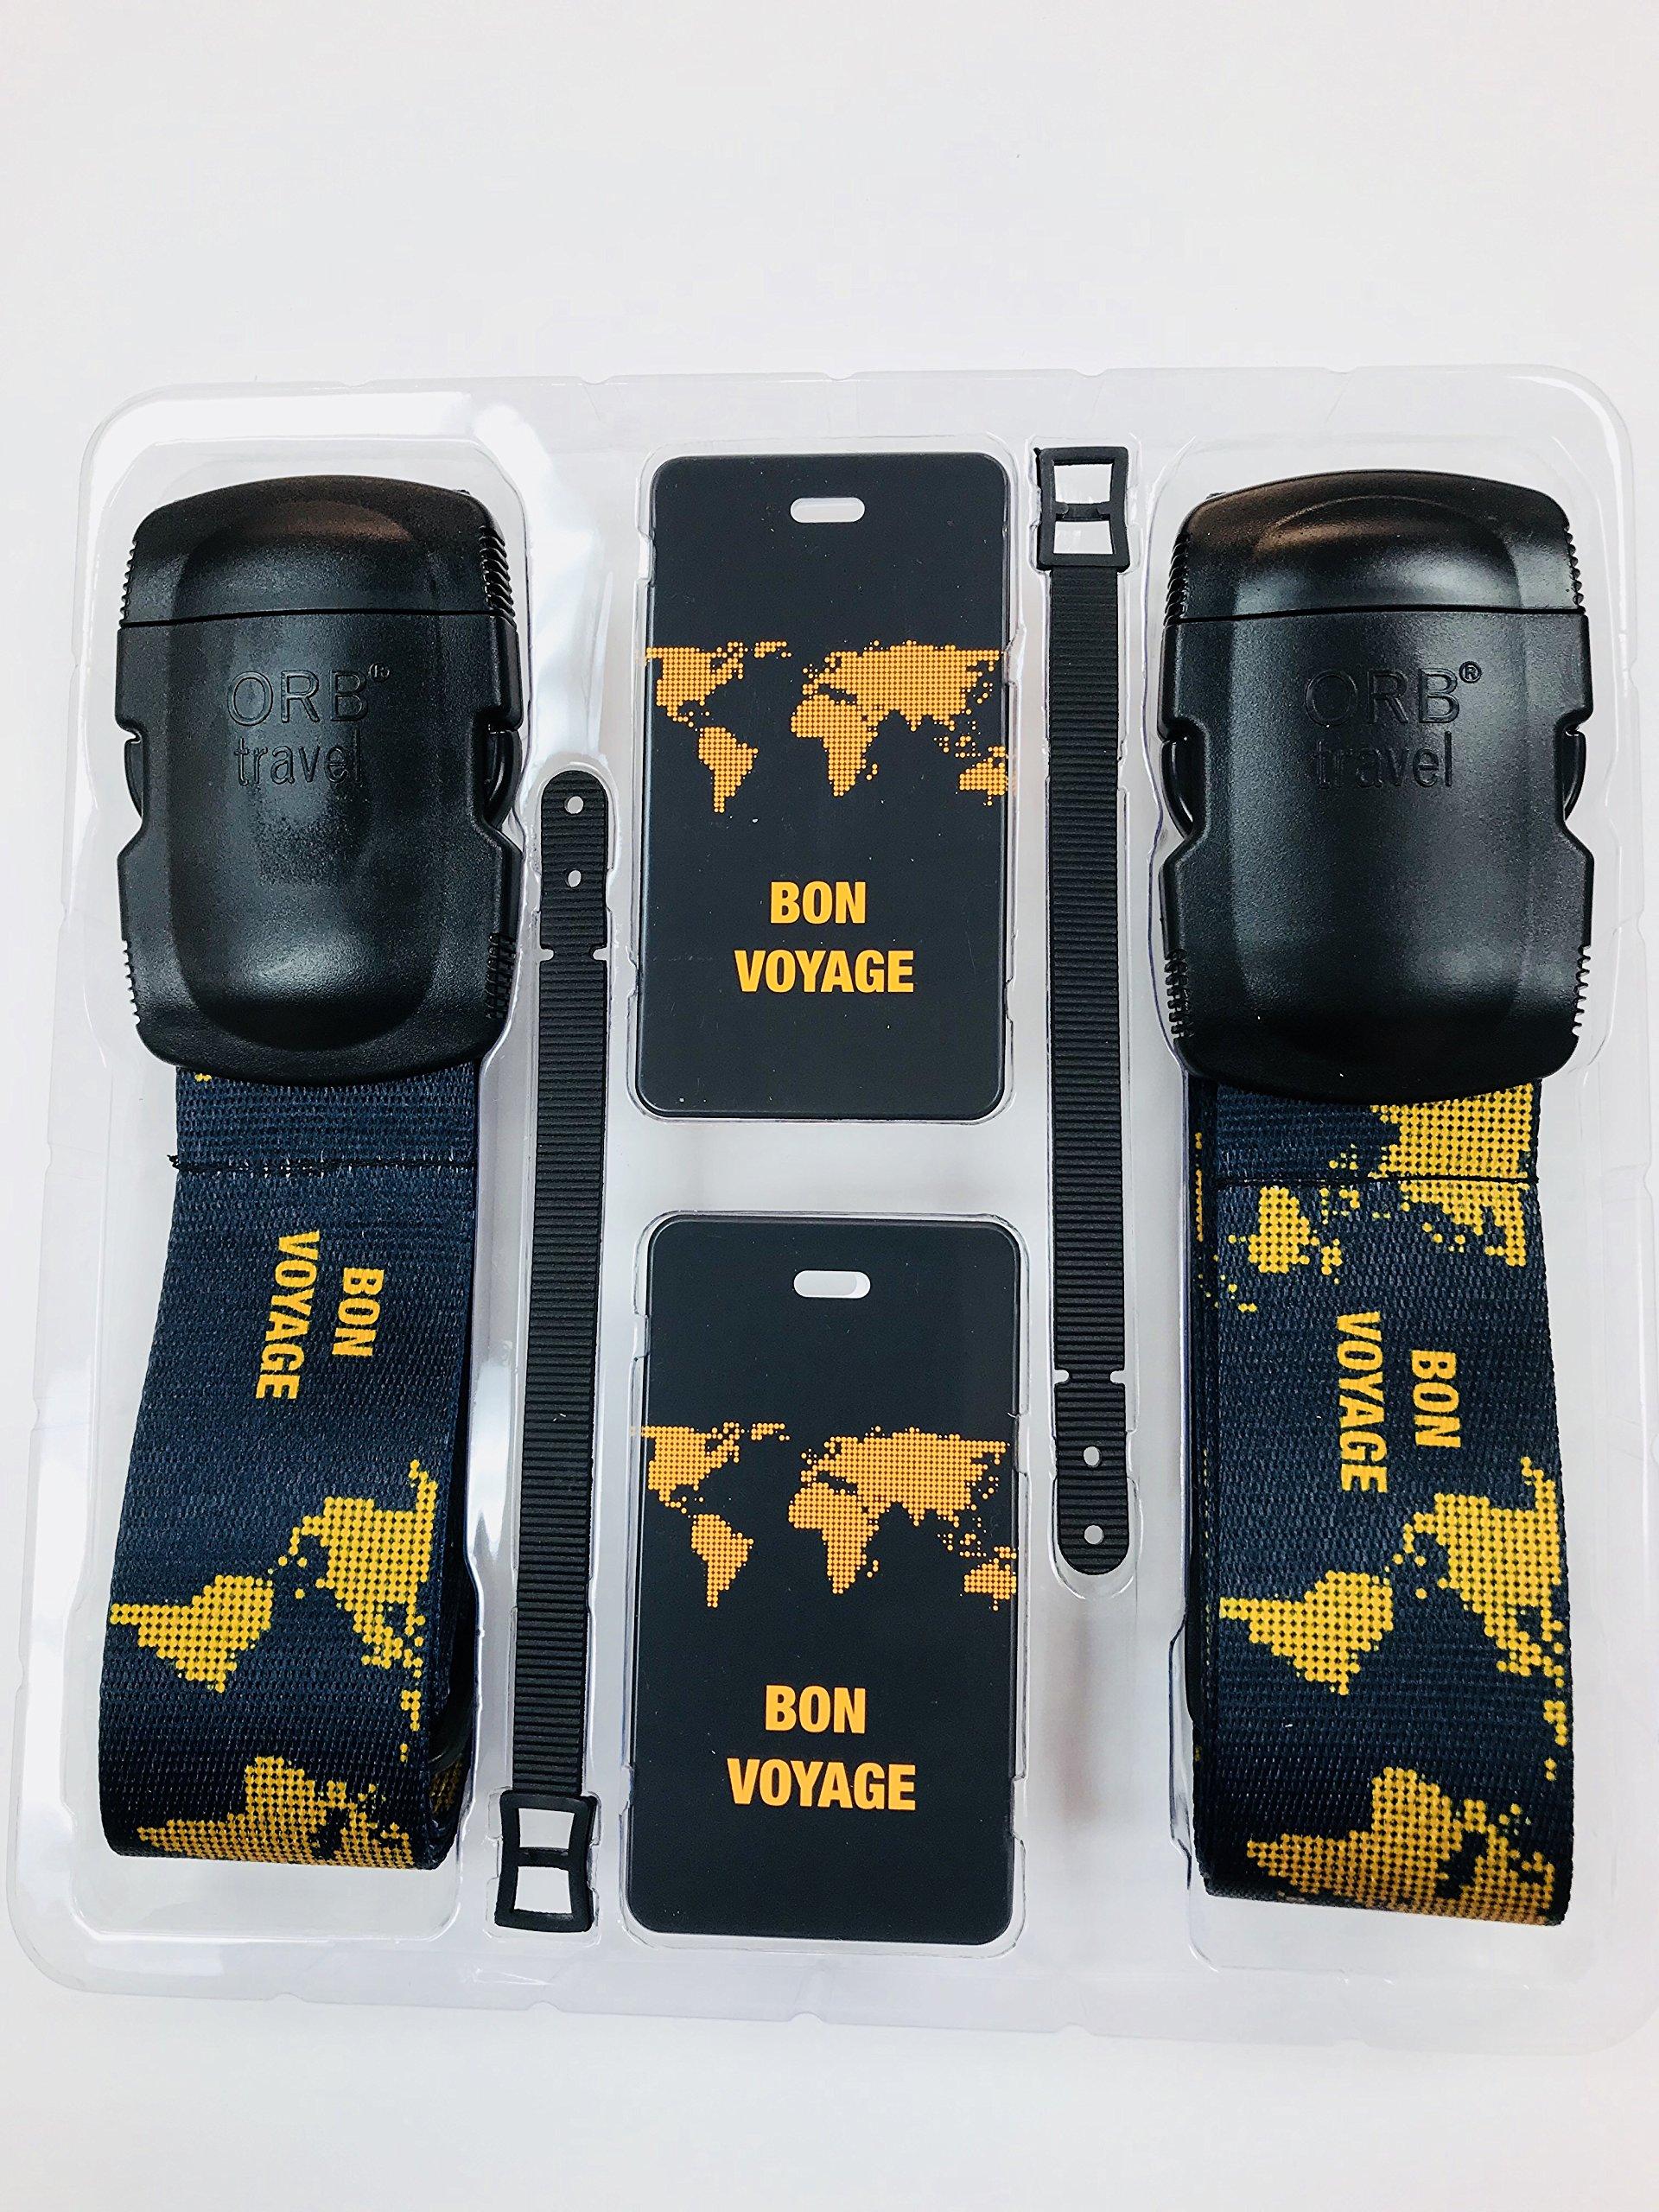 ORB - Travel Essentials Kit Luggage Strap Heavy Duty Buckle. (TE208-Tangerine)